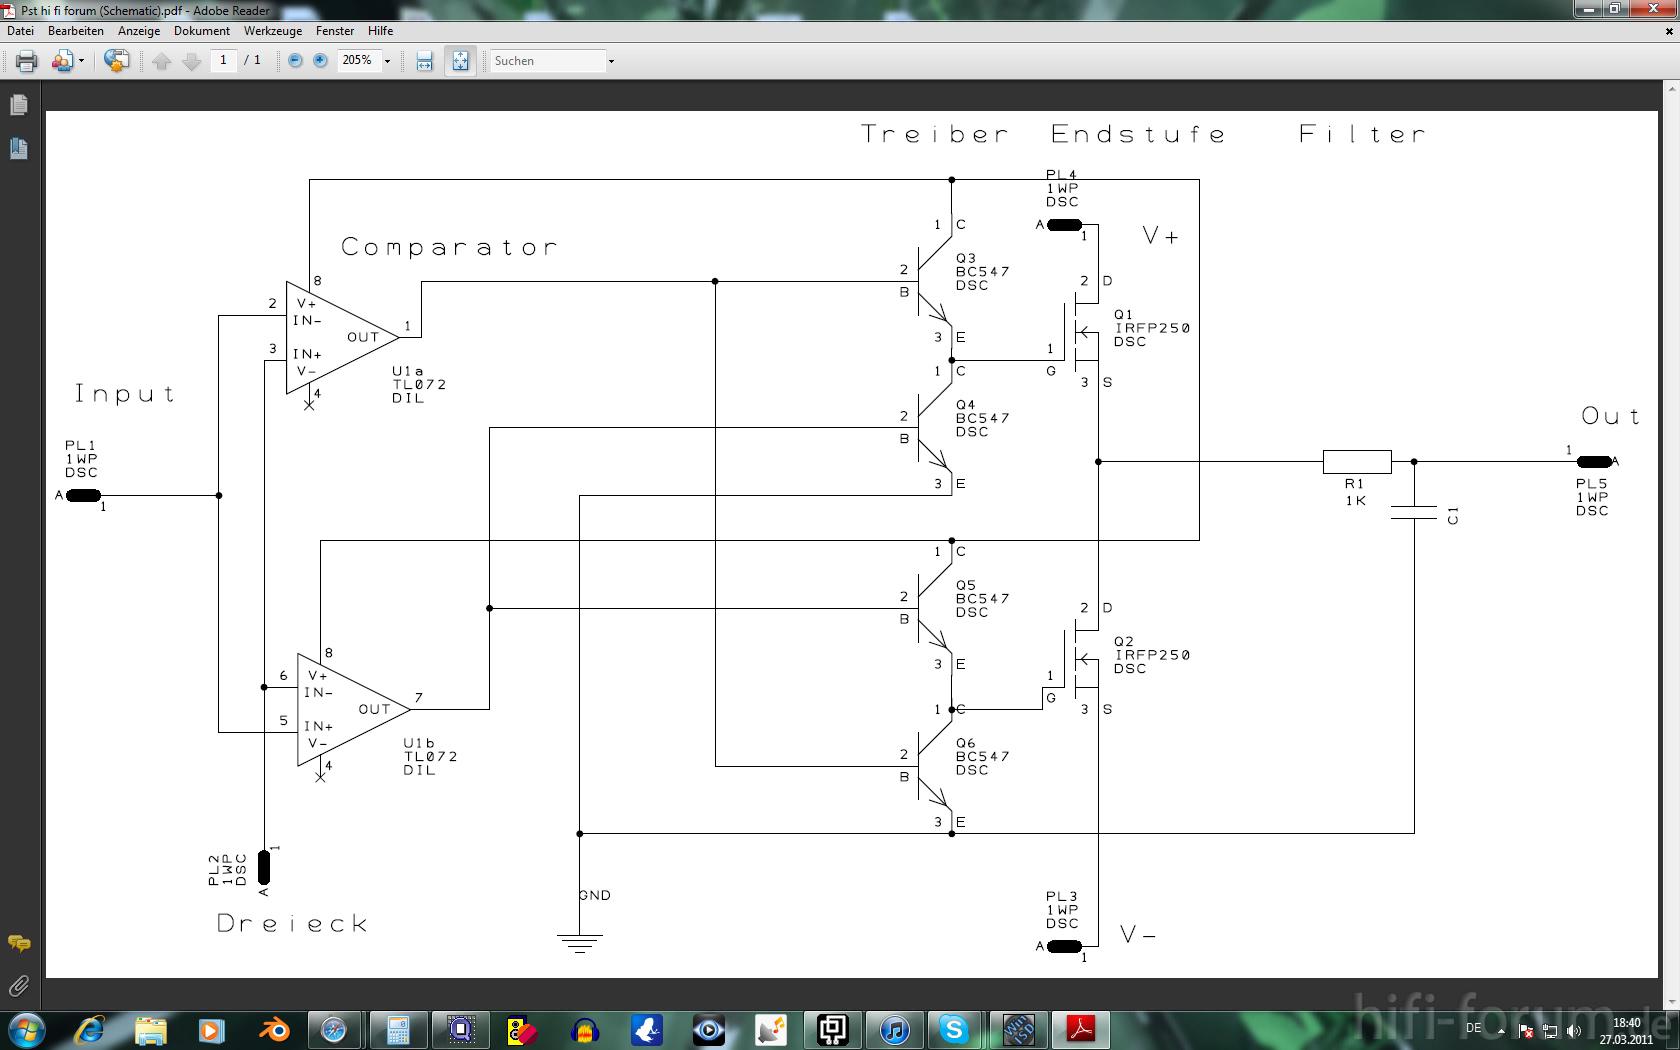 Großzügig Verkabelung Auto Audio Bilder - Schaltplan Serie Circuit ...